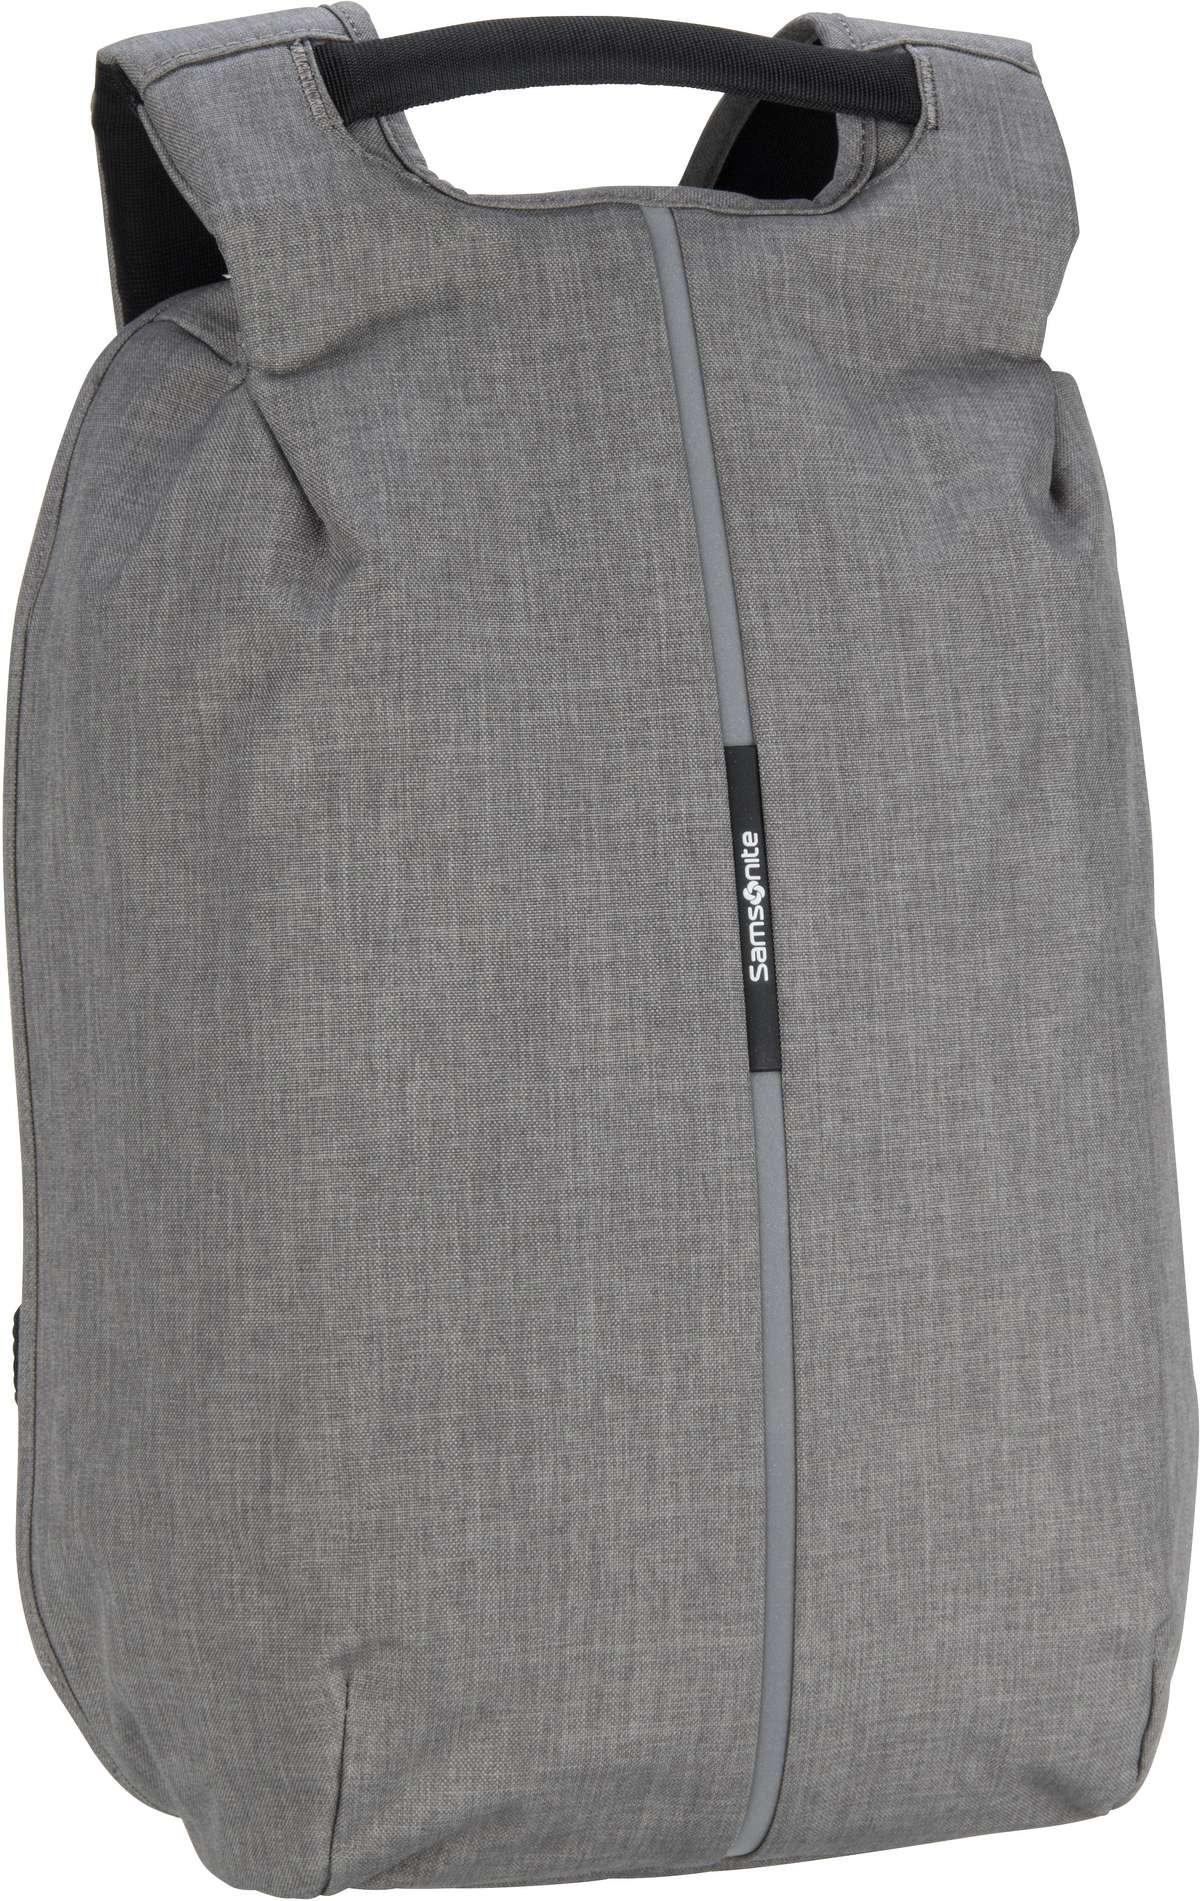 Rucksack / Daypack Securipak Laptop Backpack 15.6'' Cool Grey (17 Liter)